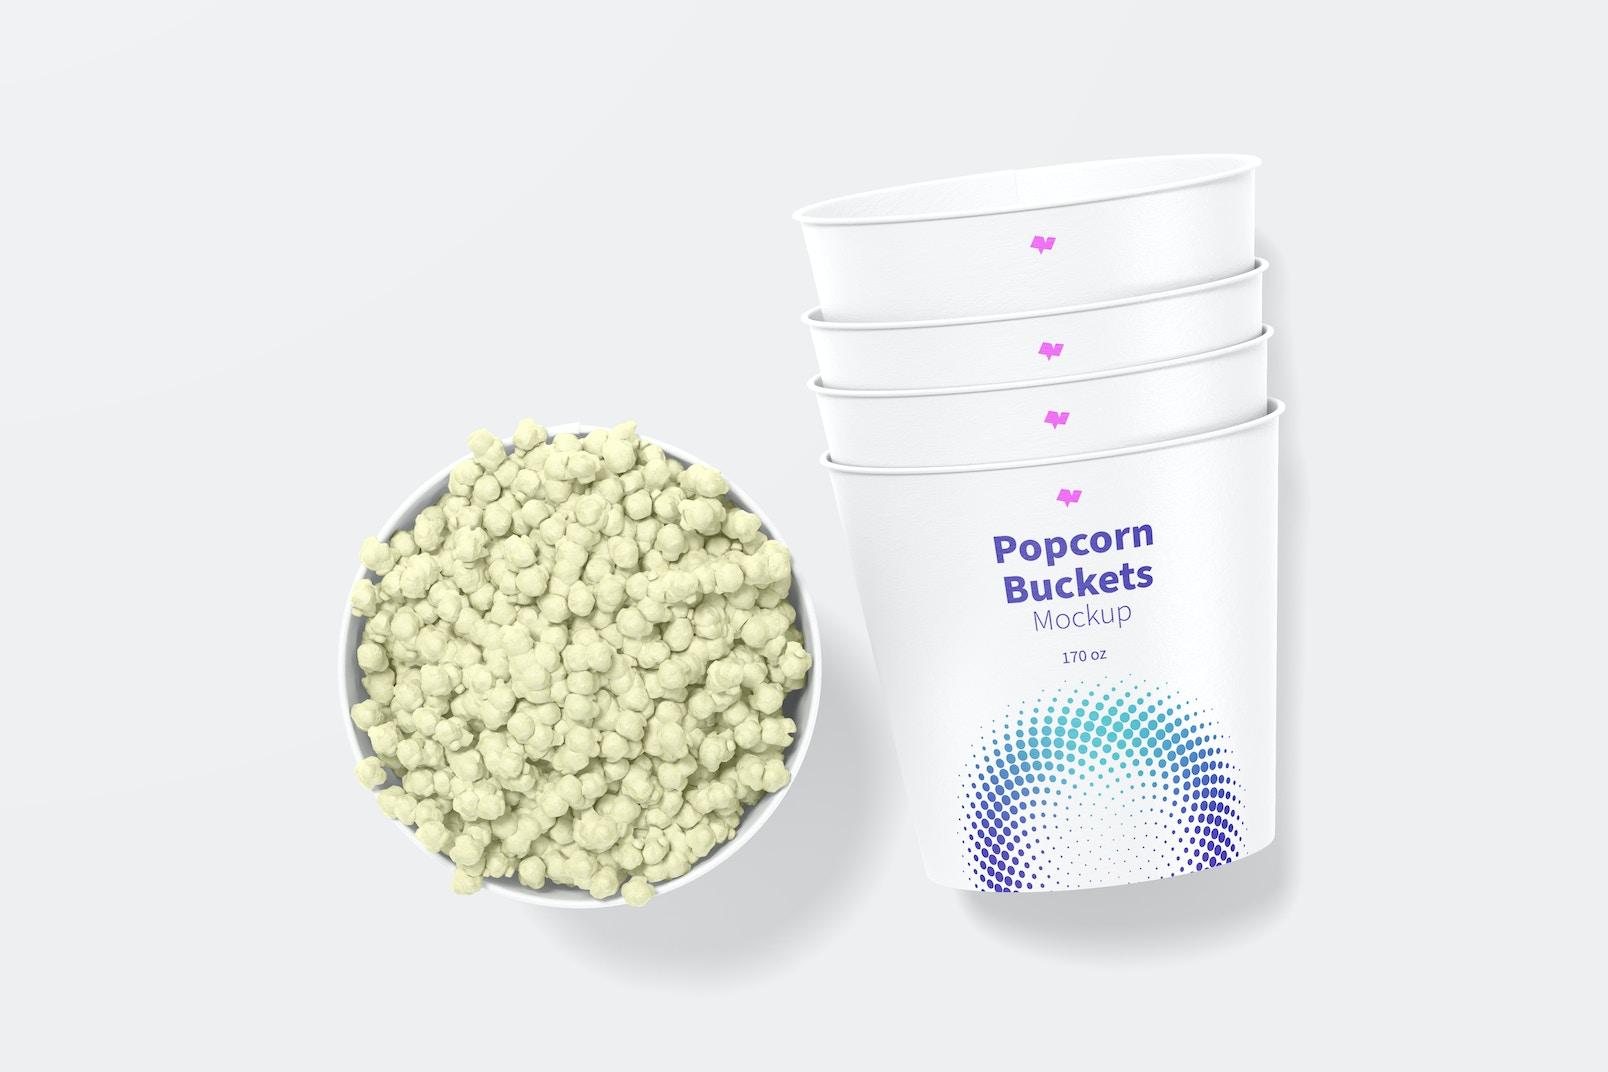 170 oz Popcorn Buckets Mockup, Top View